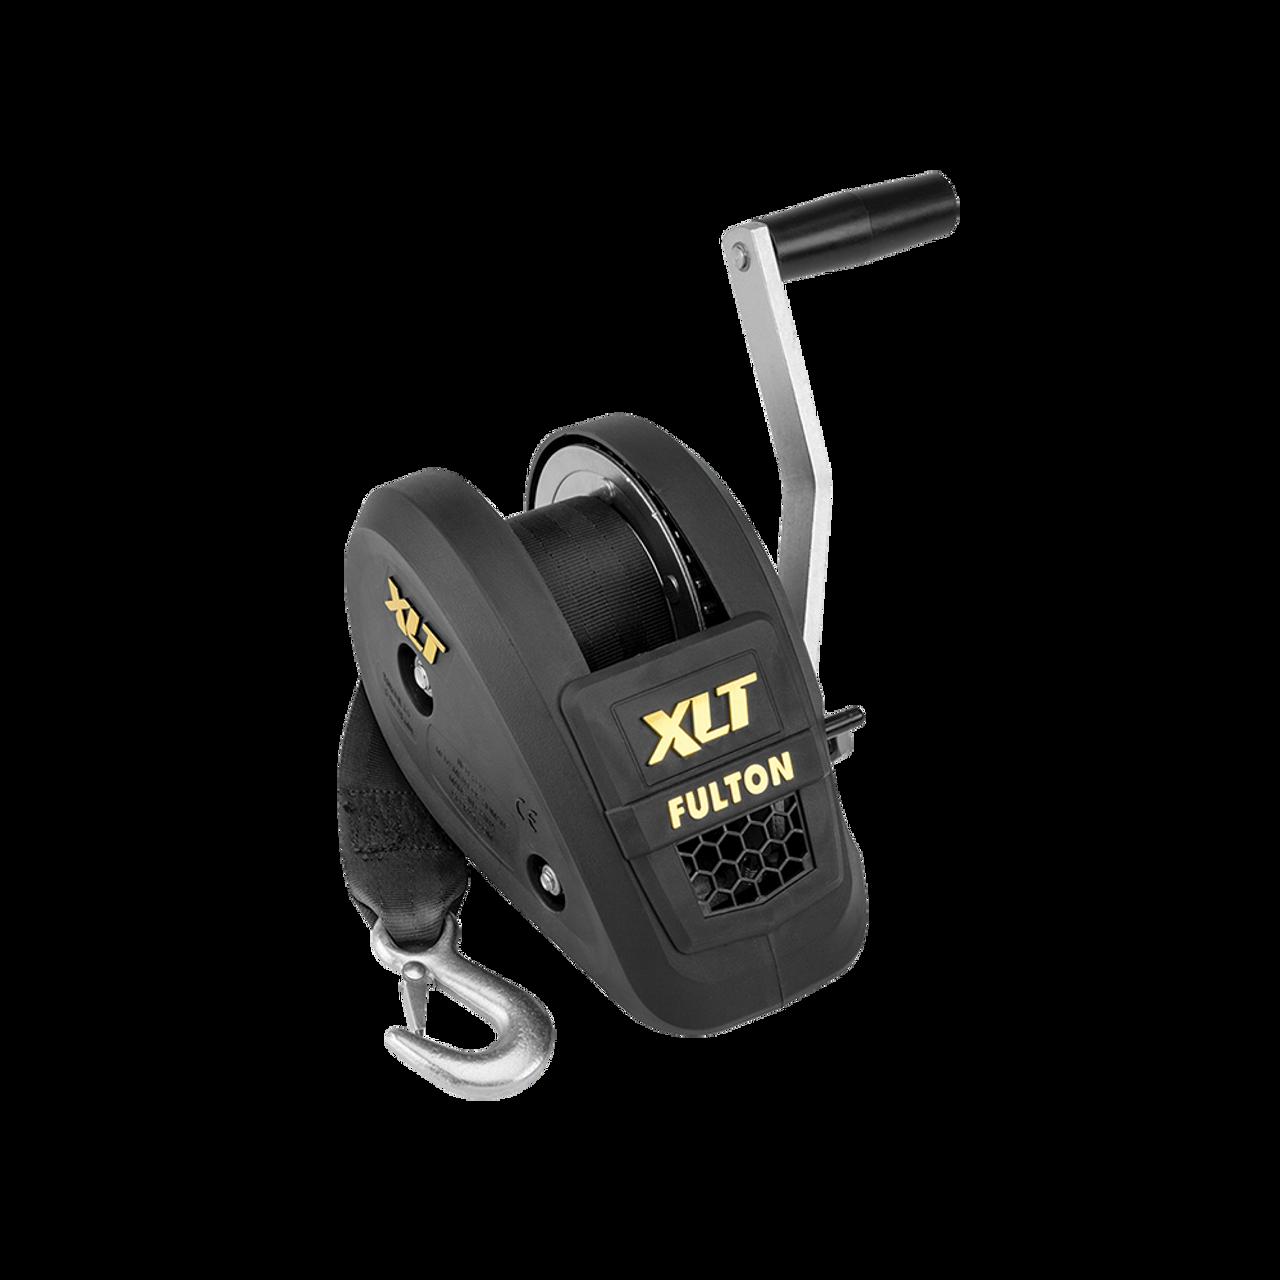 142311 --- Fulton Single Speed Trailer Winch - 1,500 lb Capacity